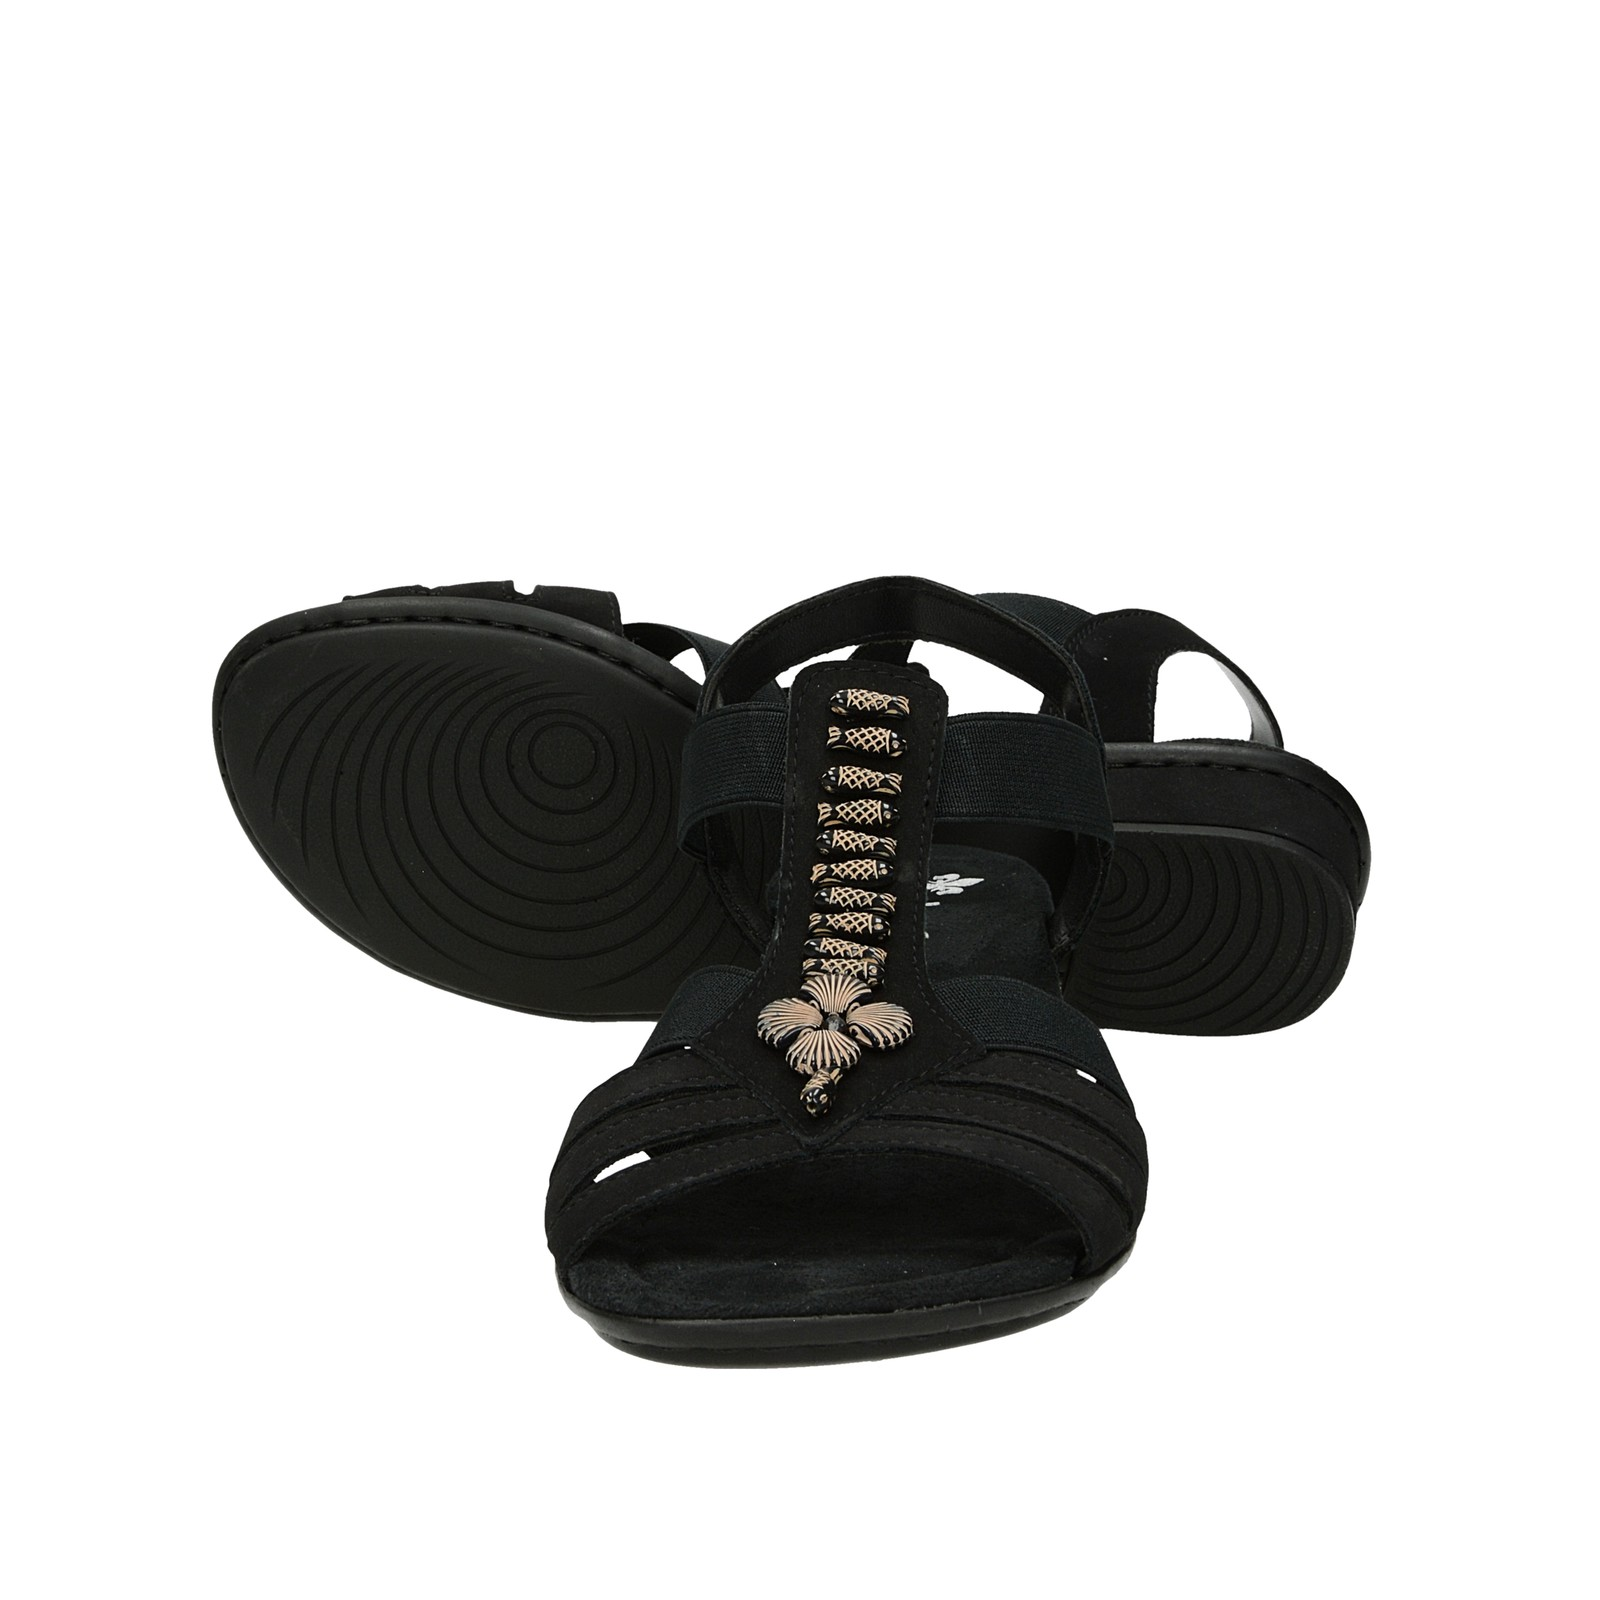 9f43c21d0ef9 ... Rieker dámske sandále s ozdobnými prvkami - čierne ...